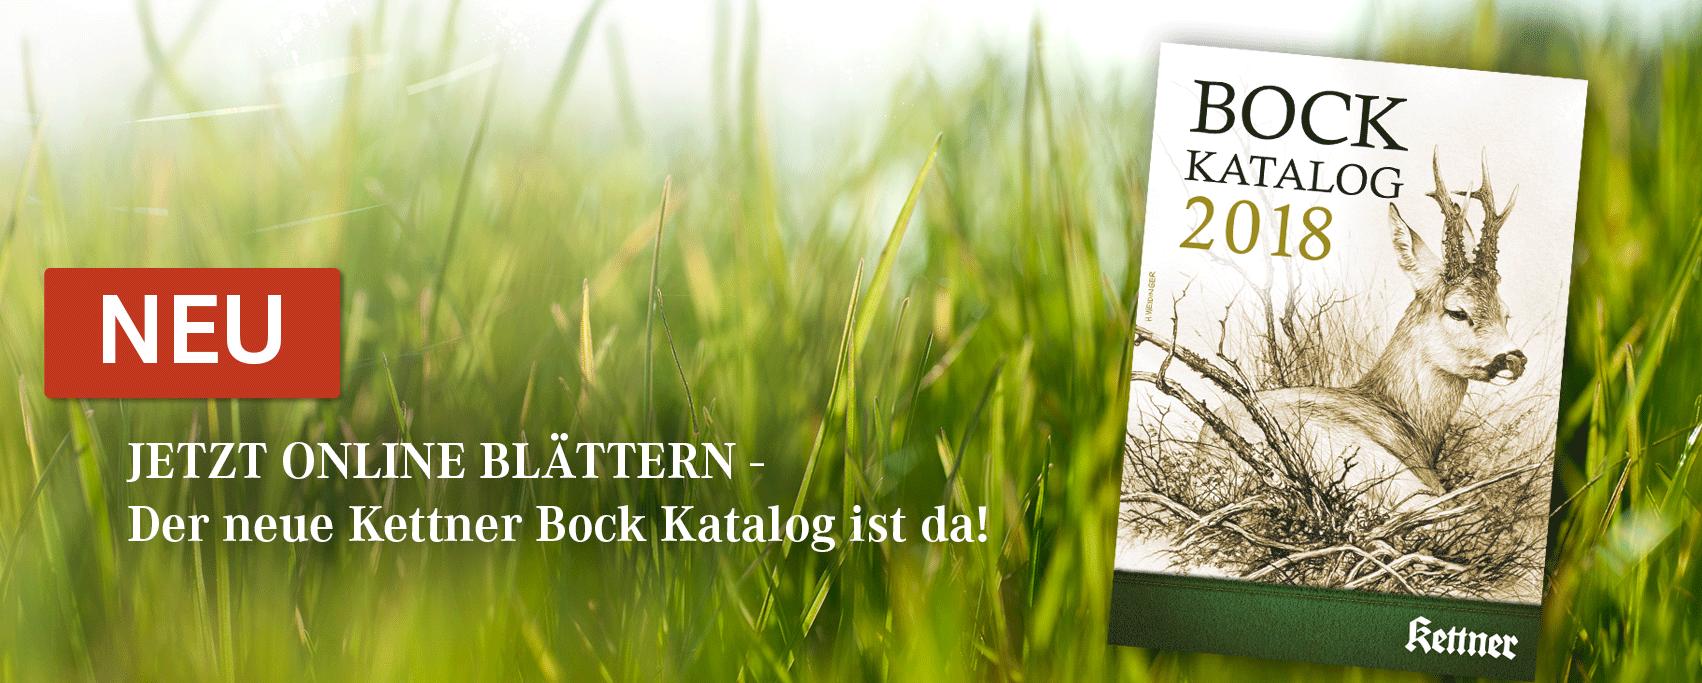 Online Katalog Bock